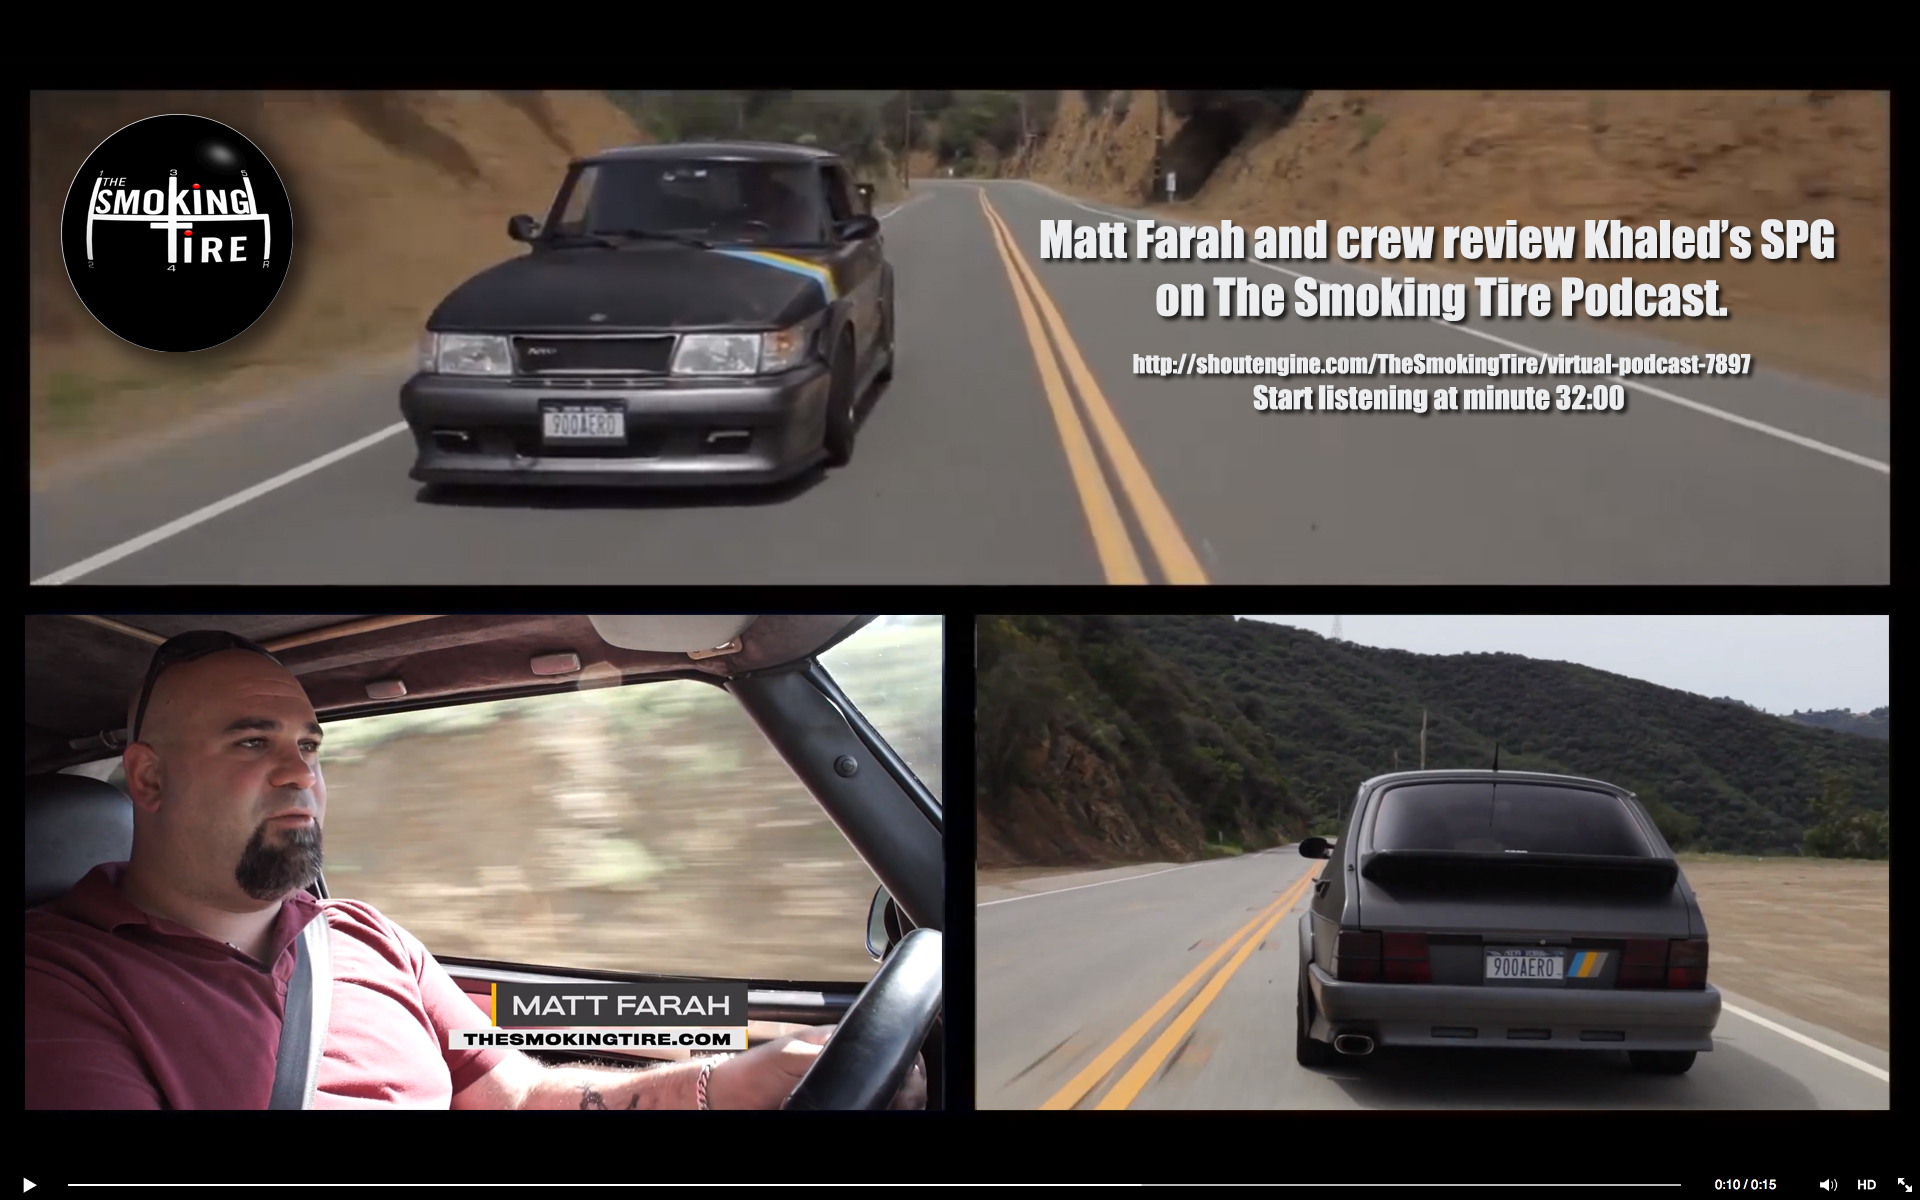 Matt farah reviews the SPG on the smoking tire podcast .jpg